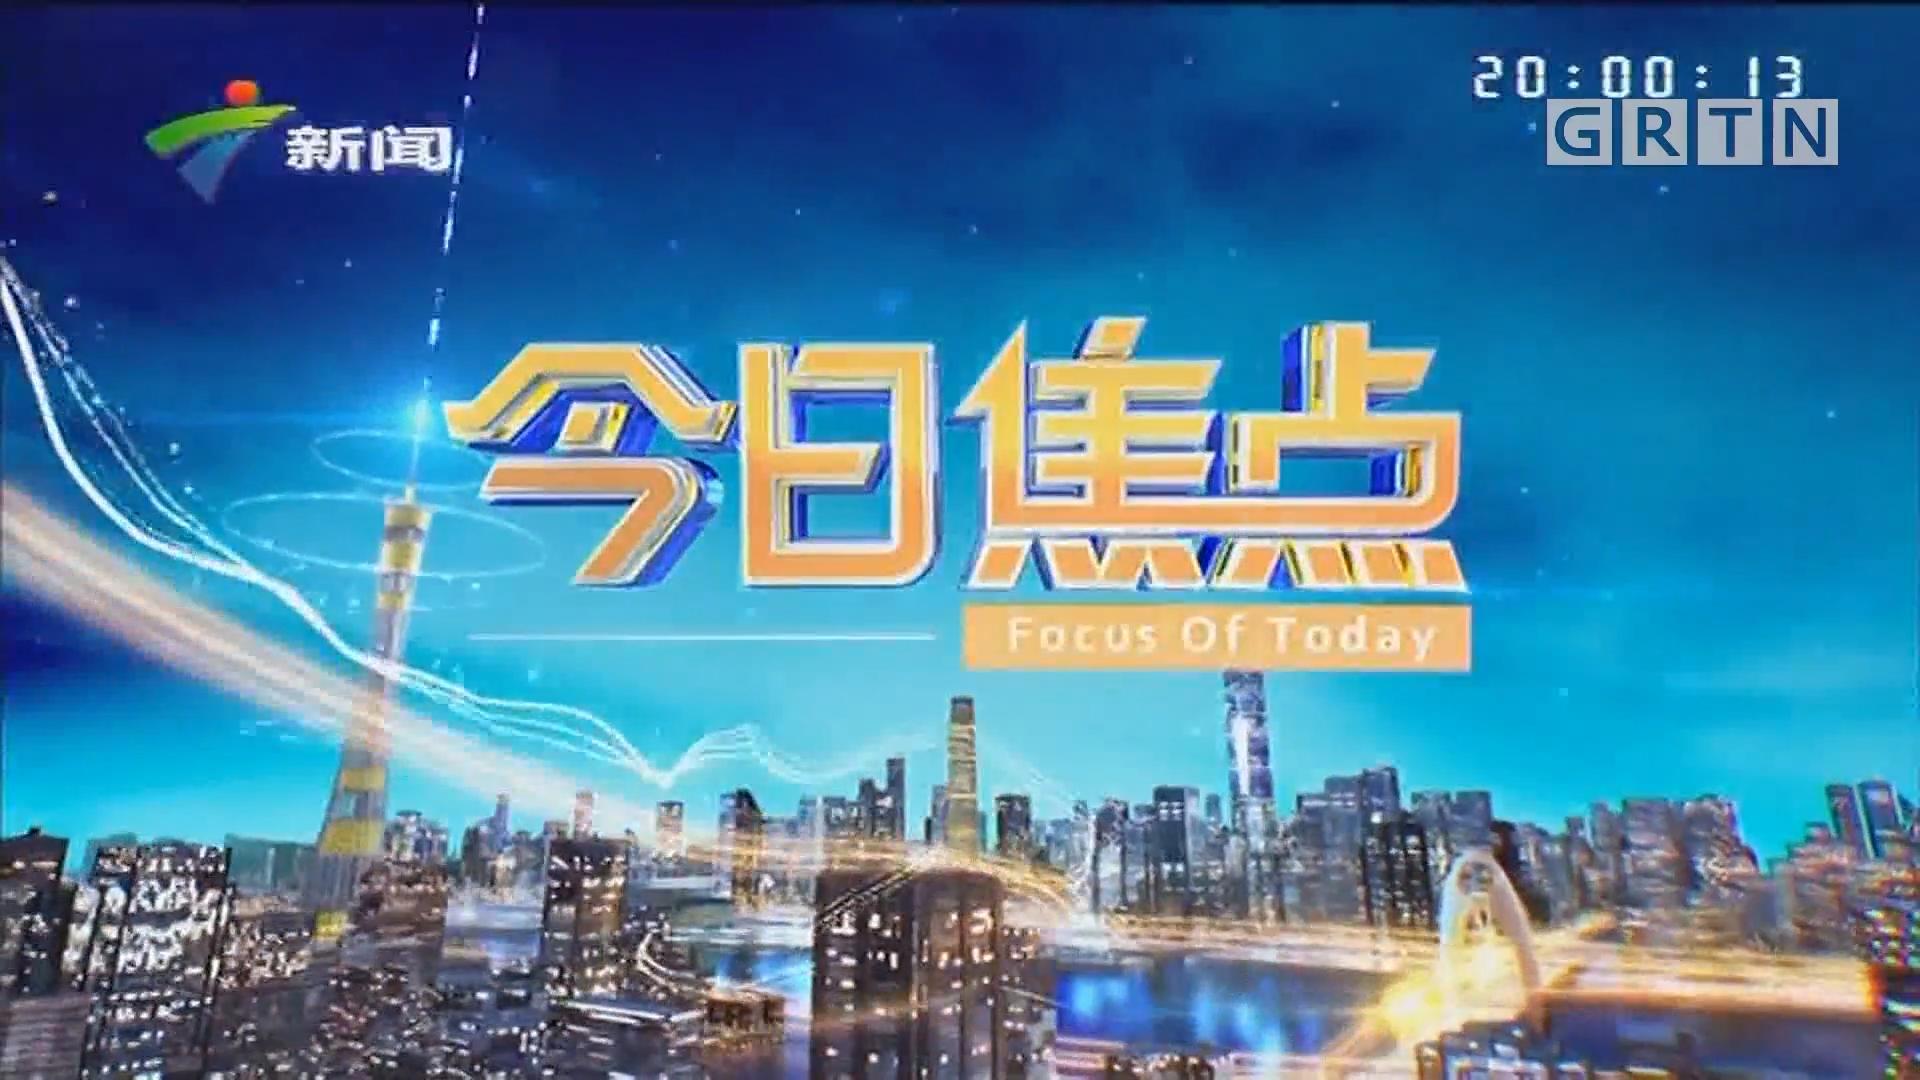 [HD][2019-07-22]今日焦点:科创板开市交易:开市鸣锣 科创板今天正式挂牌交易